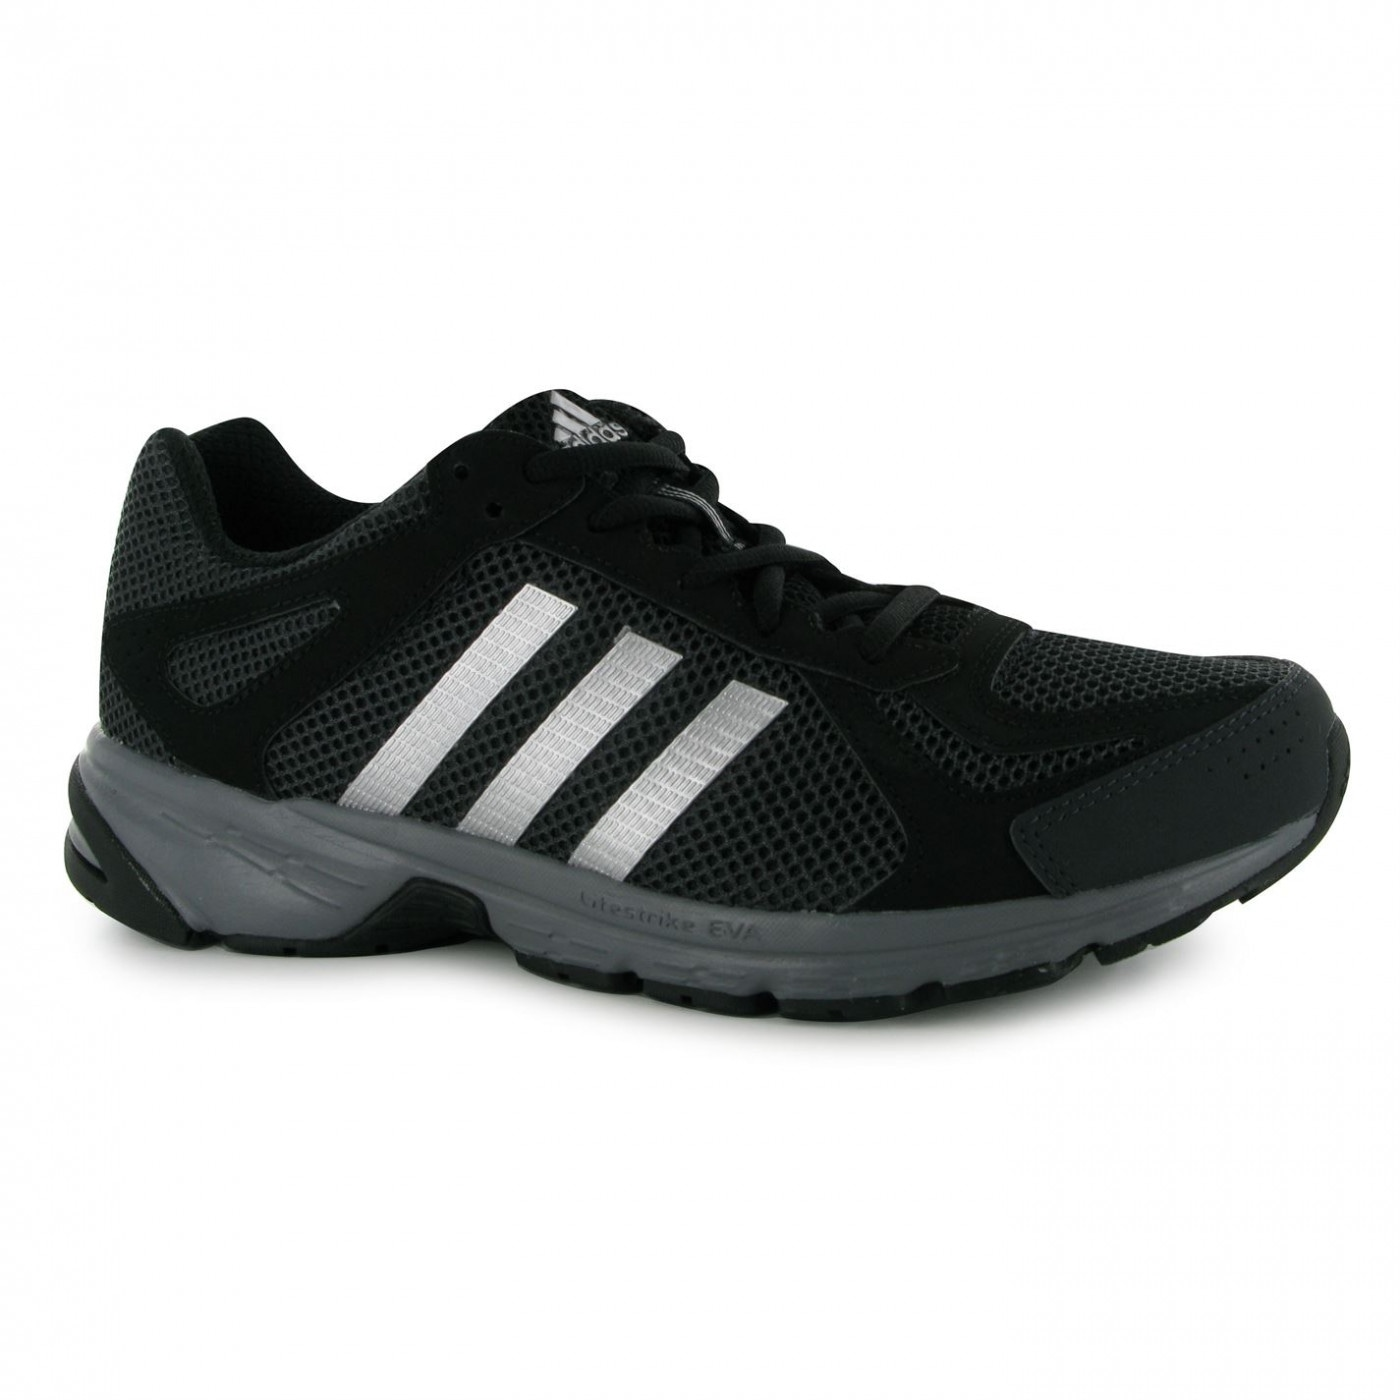 adidas duramo 55 running shoes